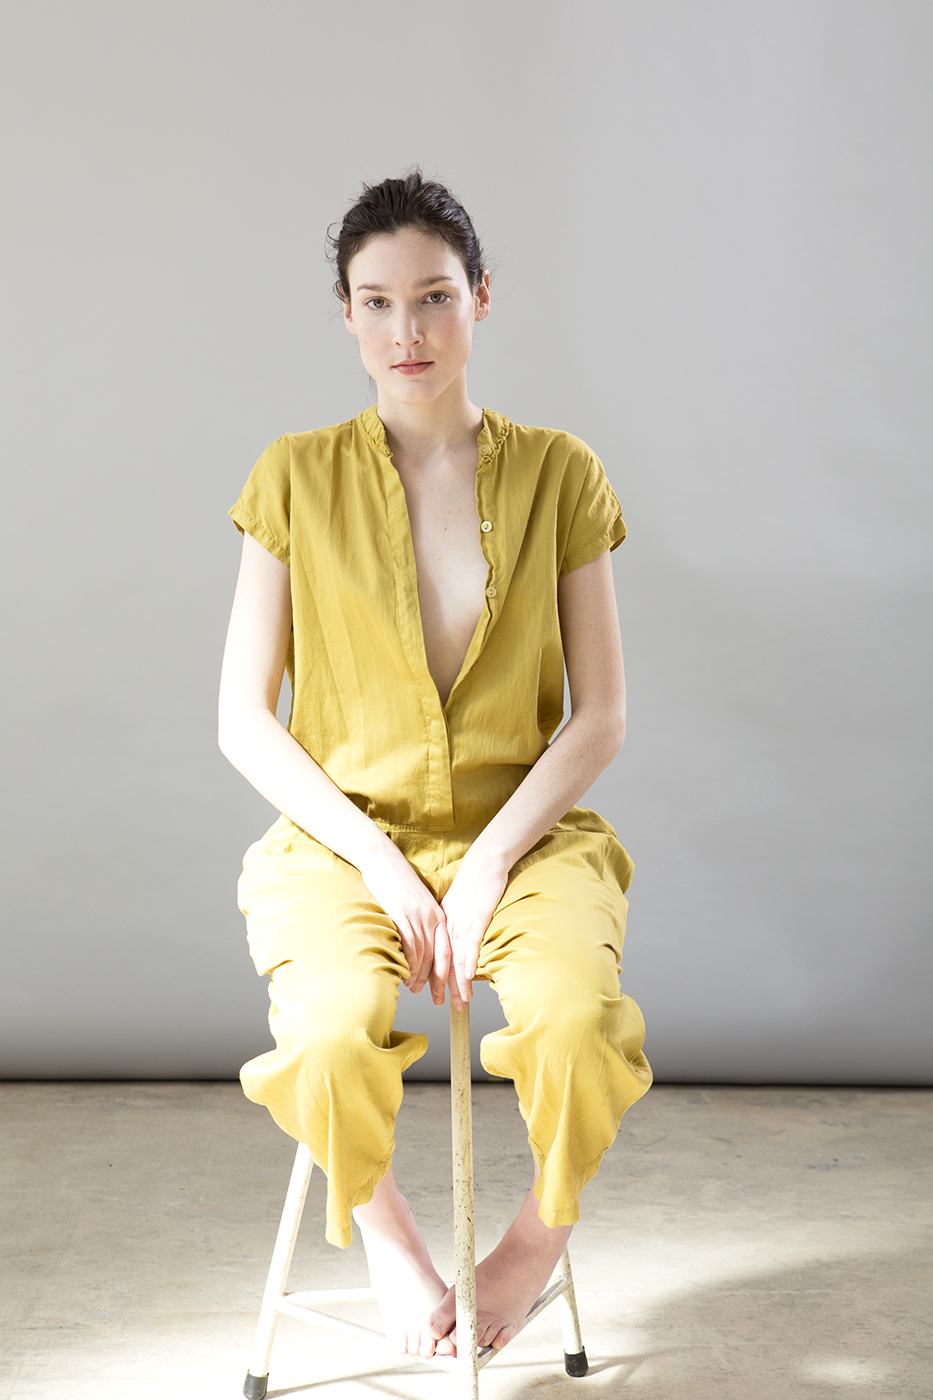 DK_yellow.jumpsuit.jpg